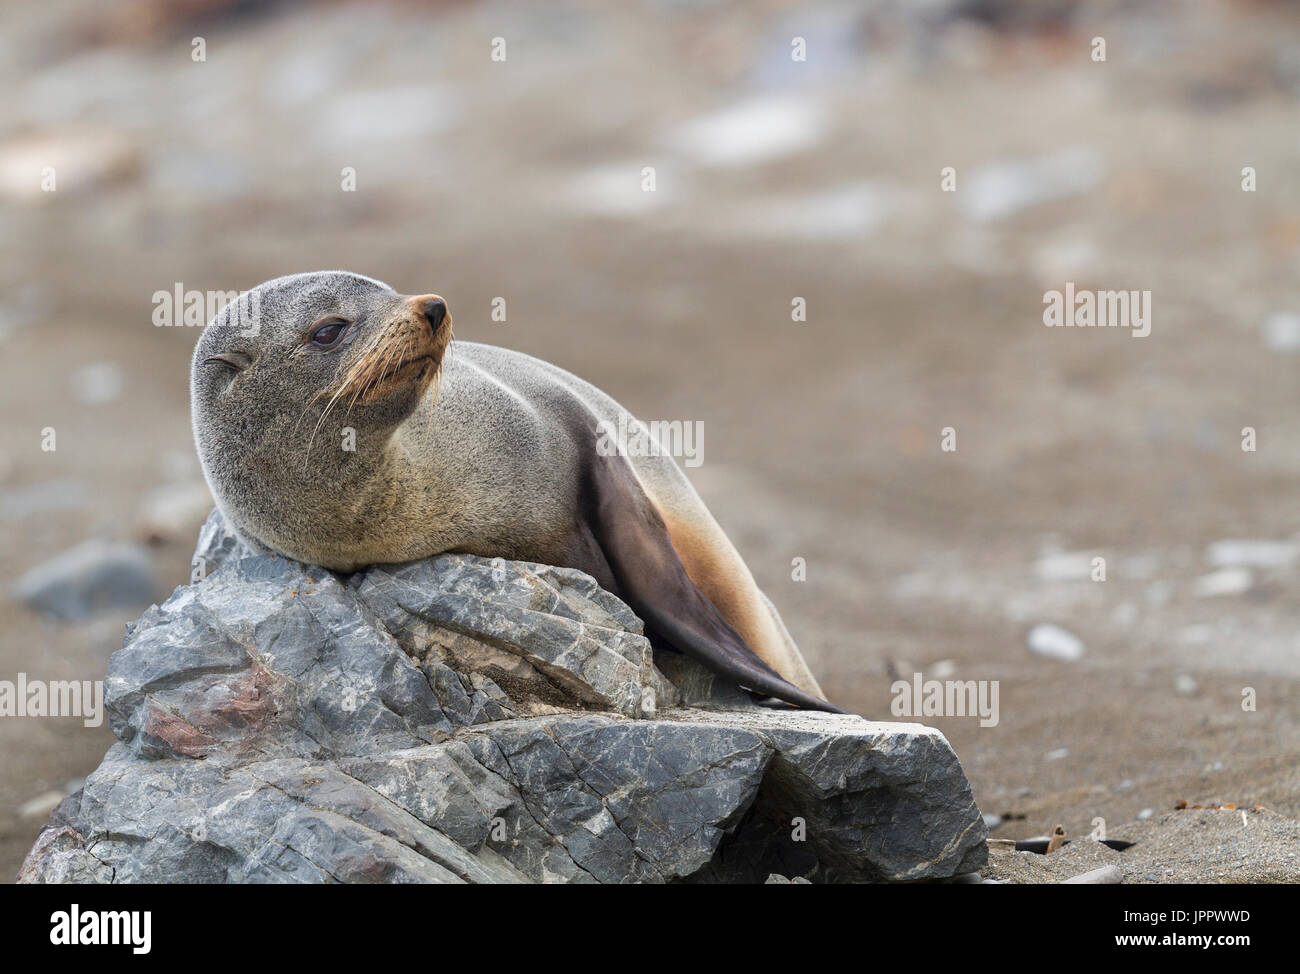 New Zealand Fur Seal (Arctocephalus forsteri) or Southern Fur seals  or Kekeno in New Zealand - Stock Image